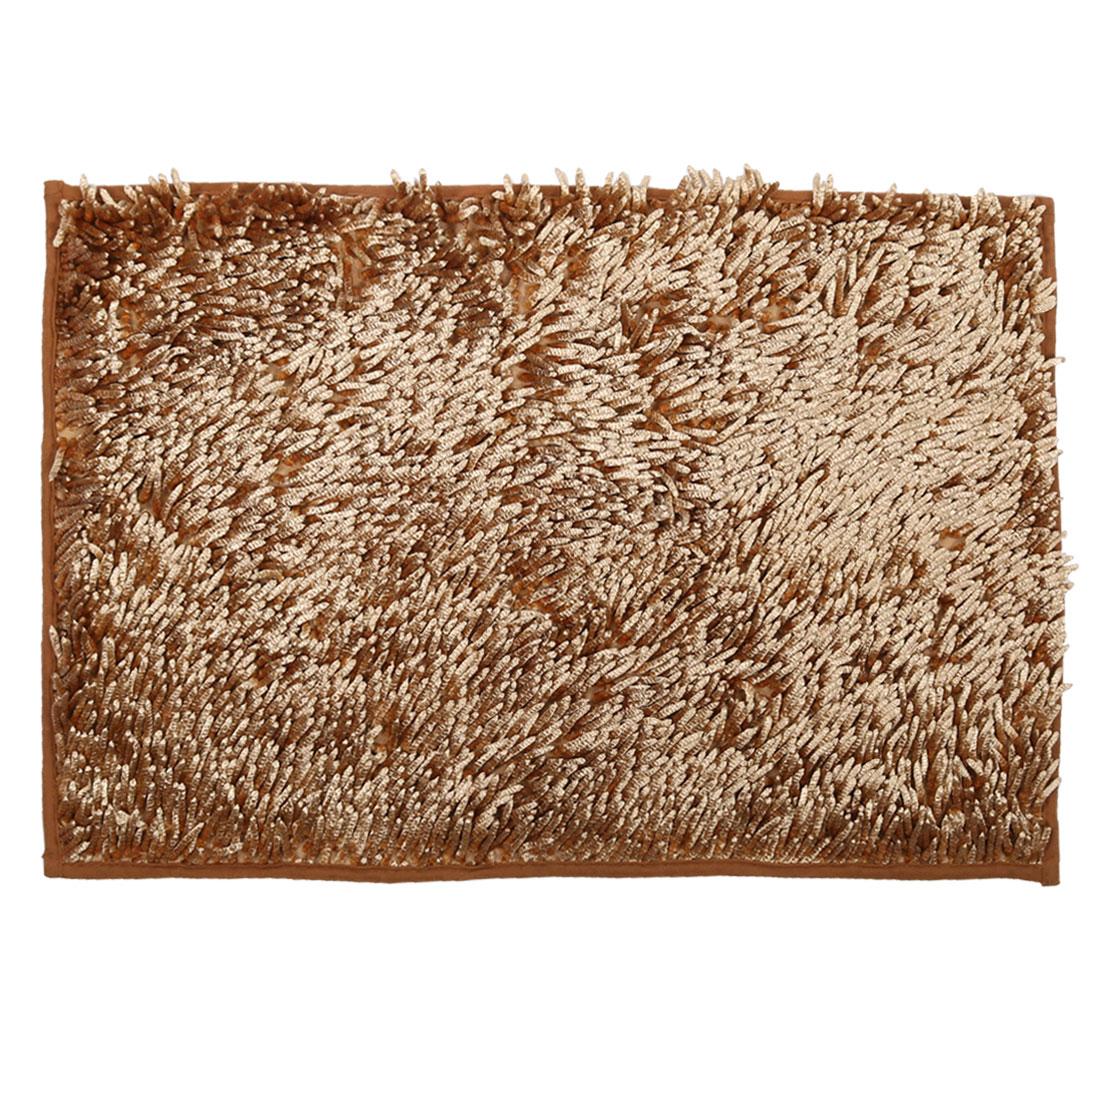 Household Bathroom Non Slip Absorbent Bath Rug Mat Shower Carpet Light Brown 32 x 20 Inches